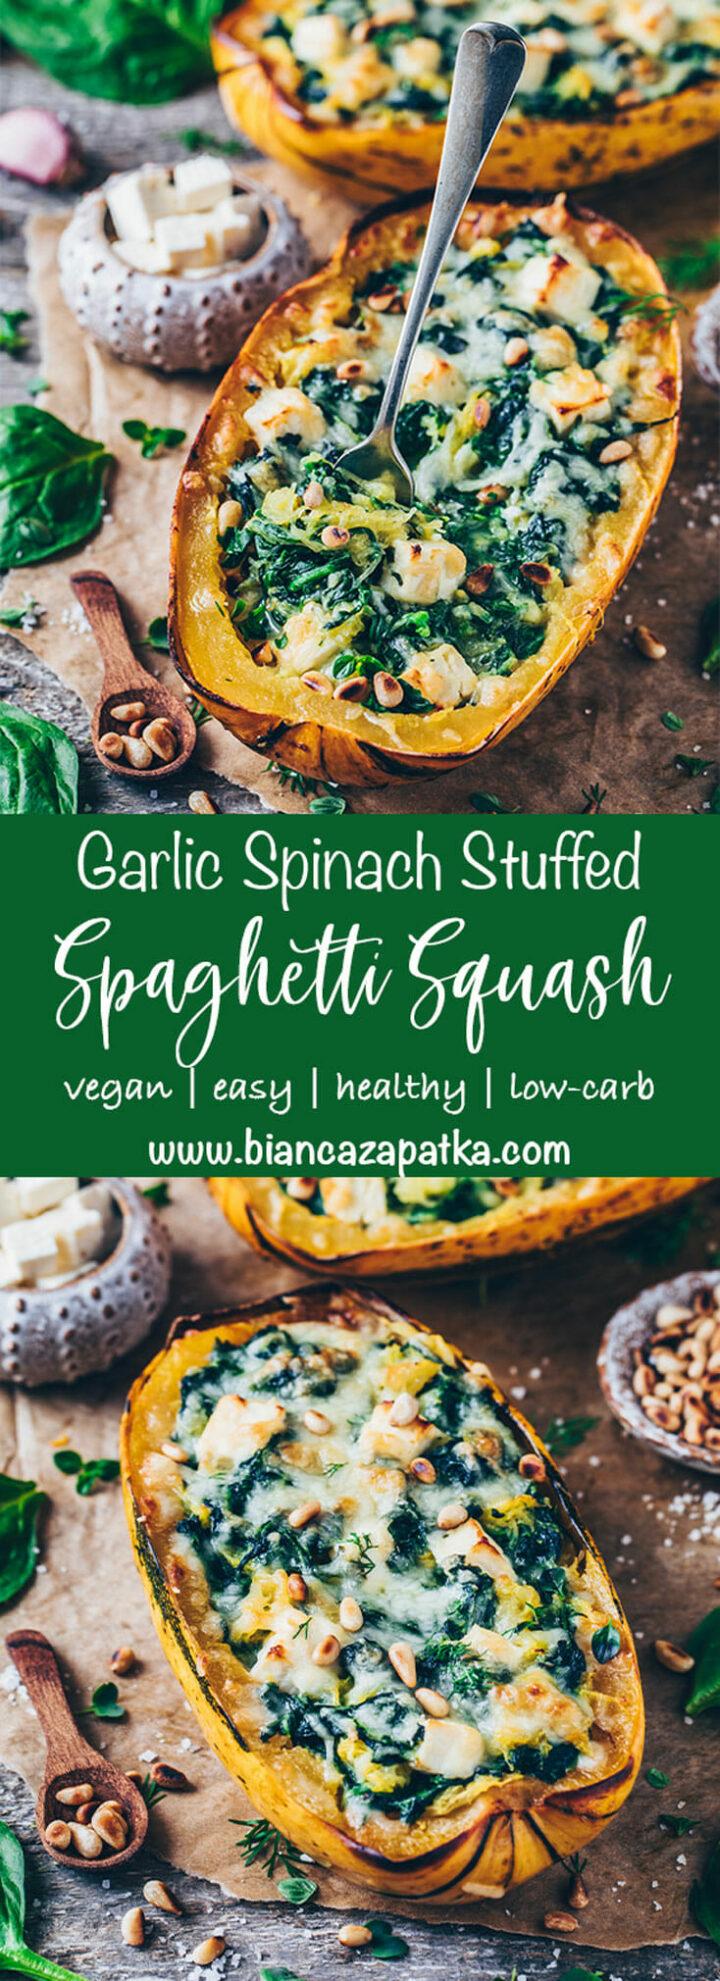 spaghetti squash boats stuffed with garlic spinach and feta cheese